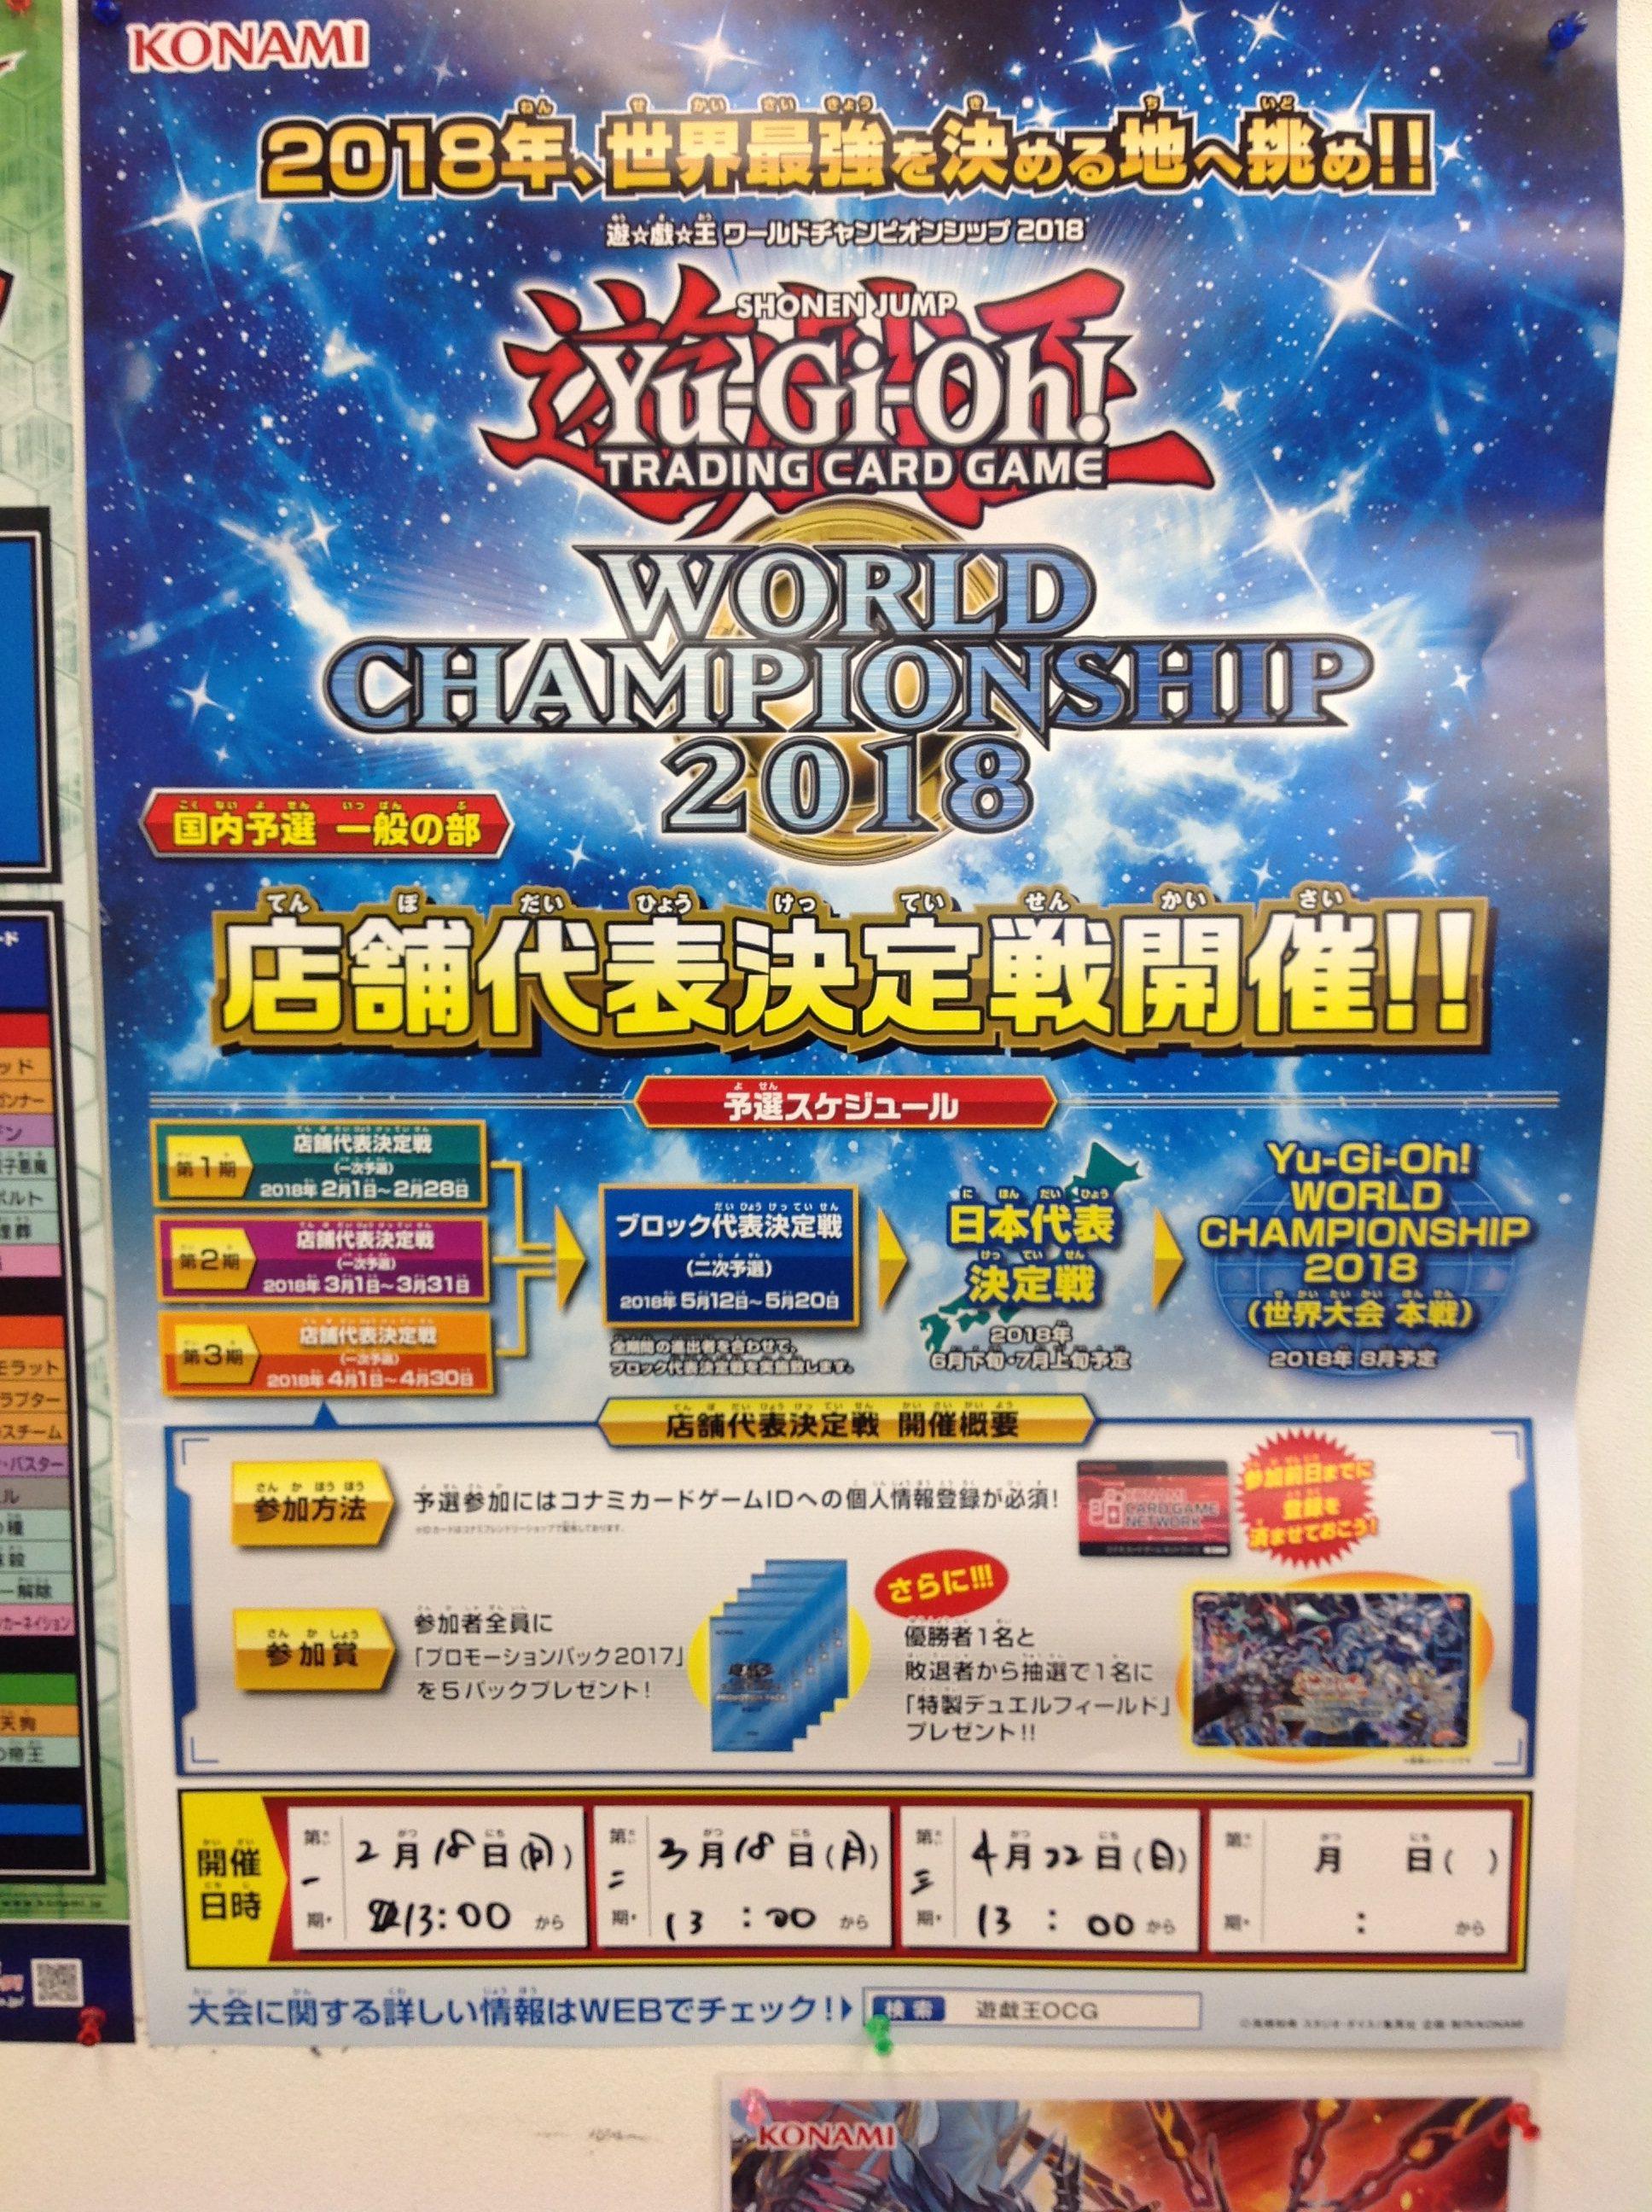 遊戯王WORLD CHAMPIONSHIP 2018 店舗代表戦 開催